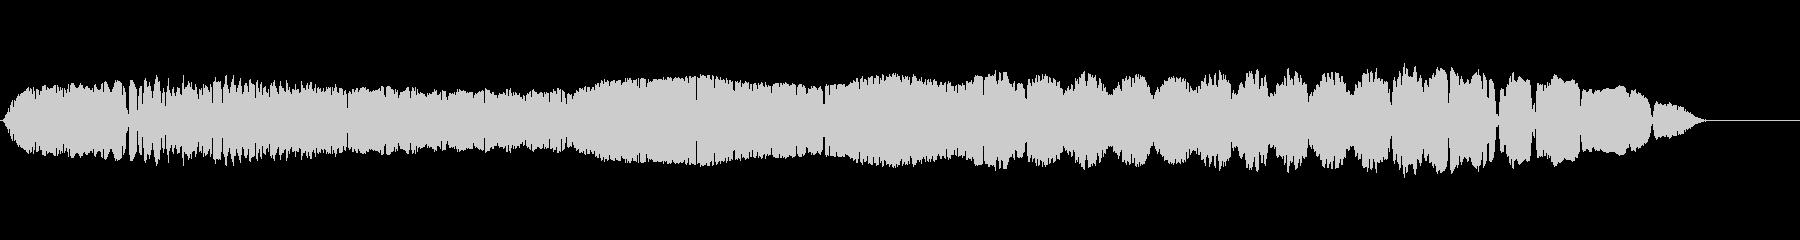 THEREMIN:FRANTIC ...の未再生の波形